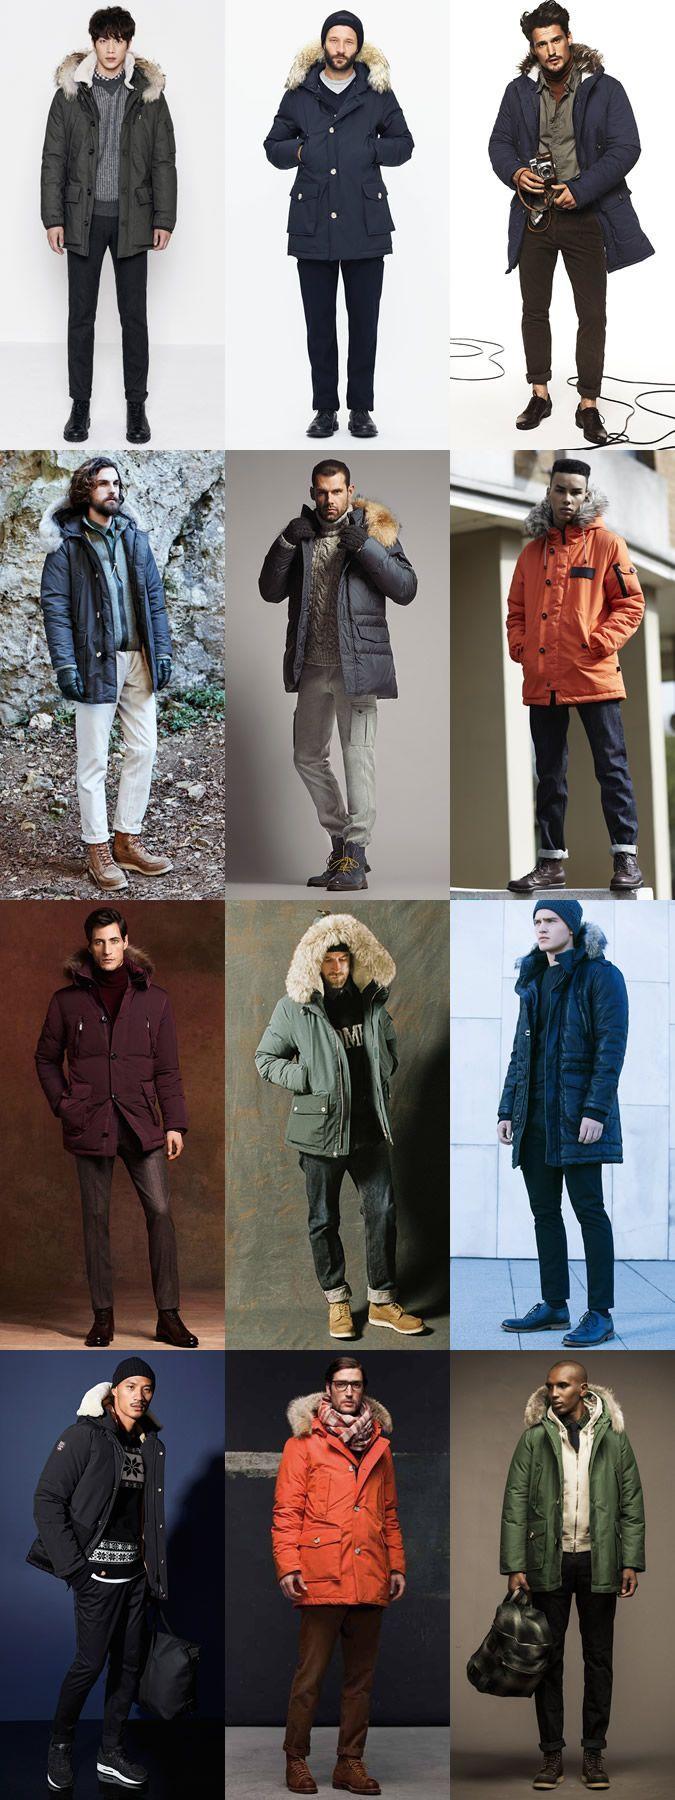 Men's Winter Parka Jackets - Winter/Apres-Ski Outfit Inspiration Lookbook